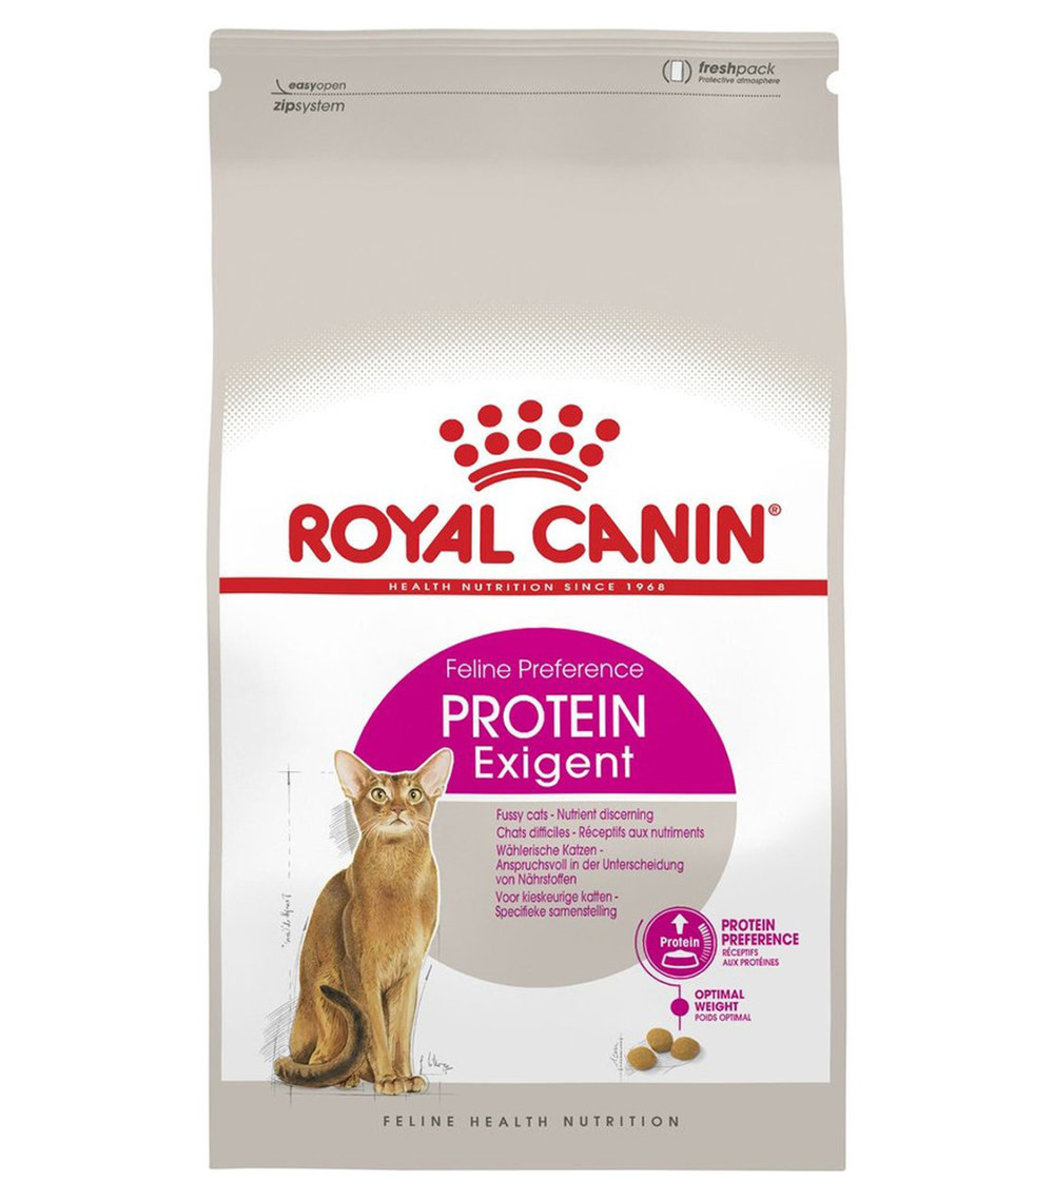 Feline Preference Protein Exigent Dry Adult Cat Food 4kg [exp:2020-11]